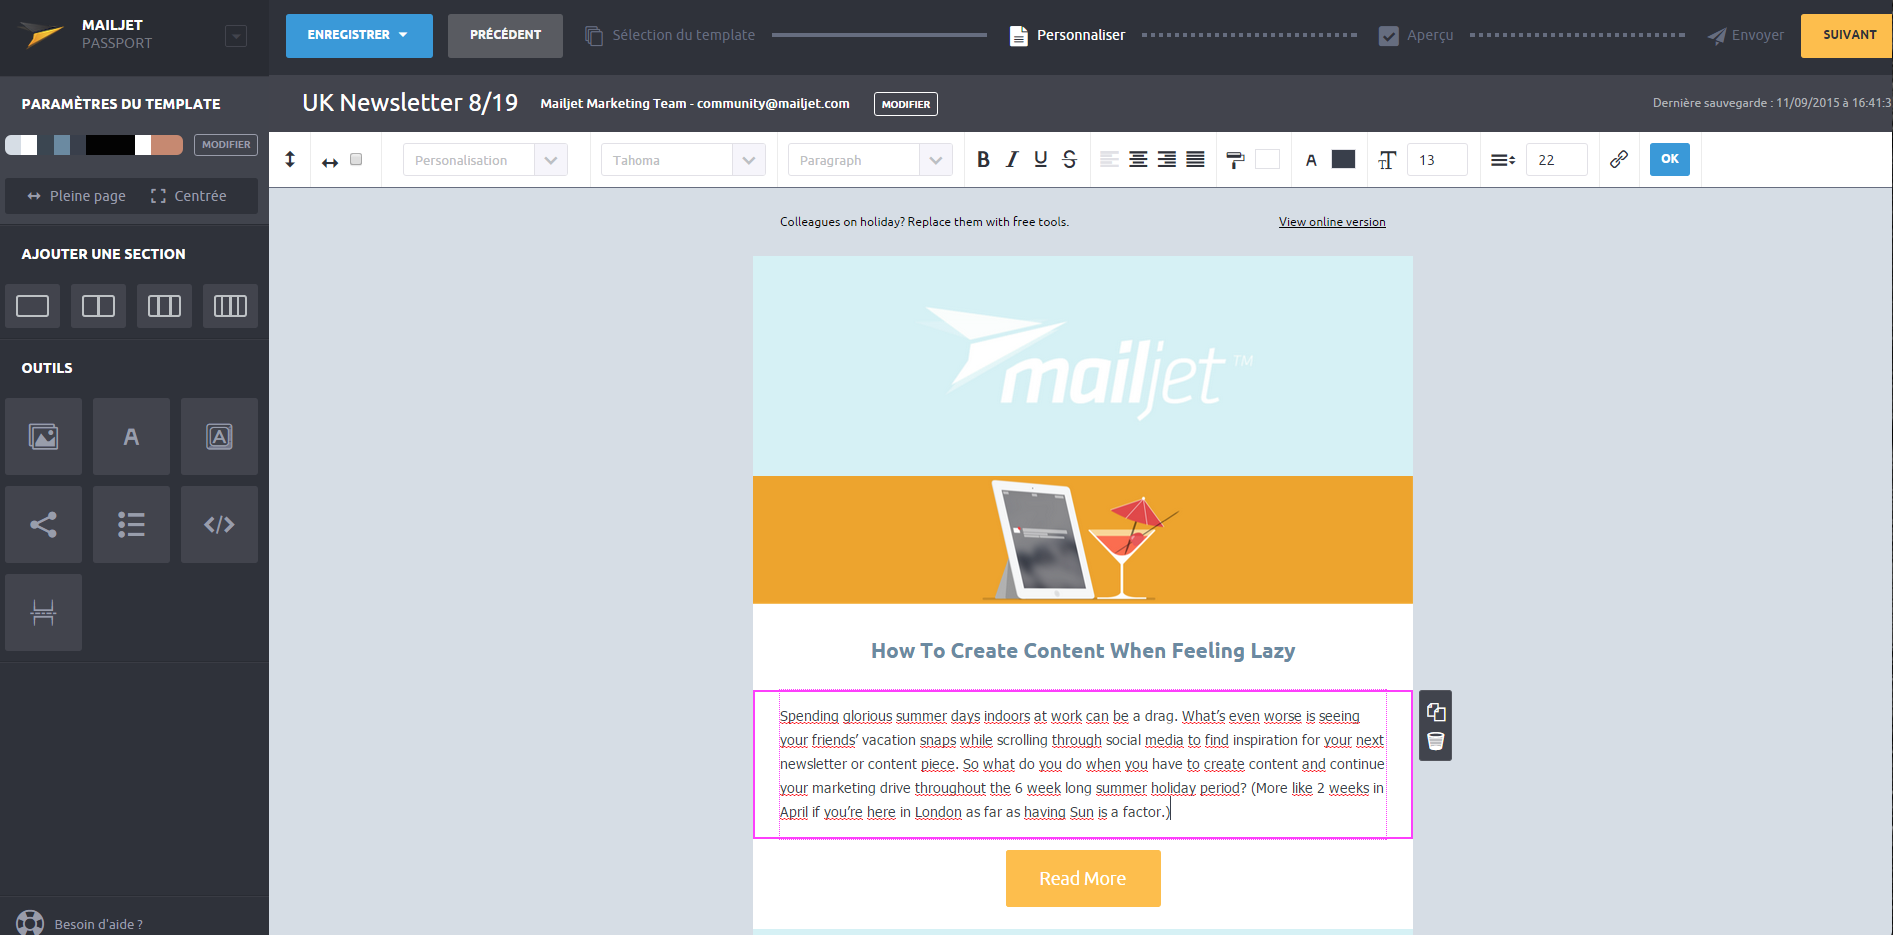 Captura de pantalla del menú de la herramienta para hacer newsletters Mailjet